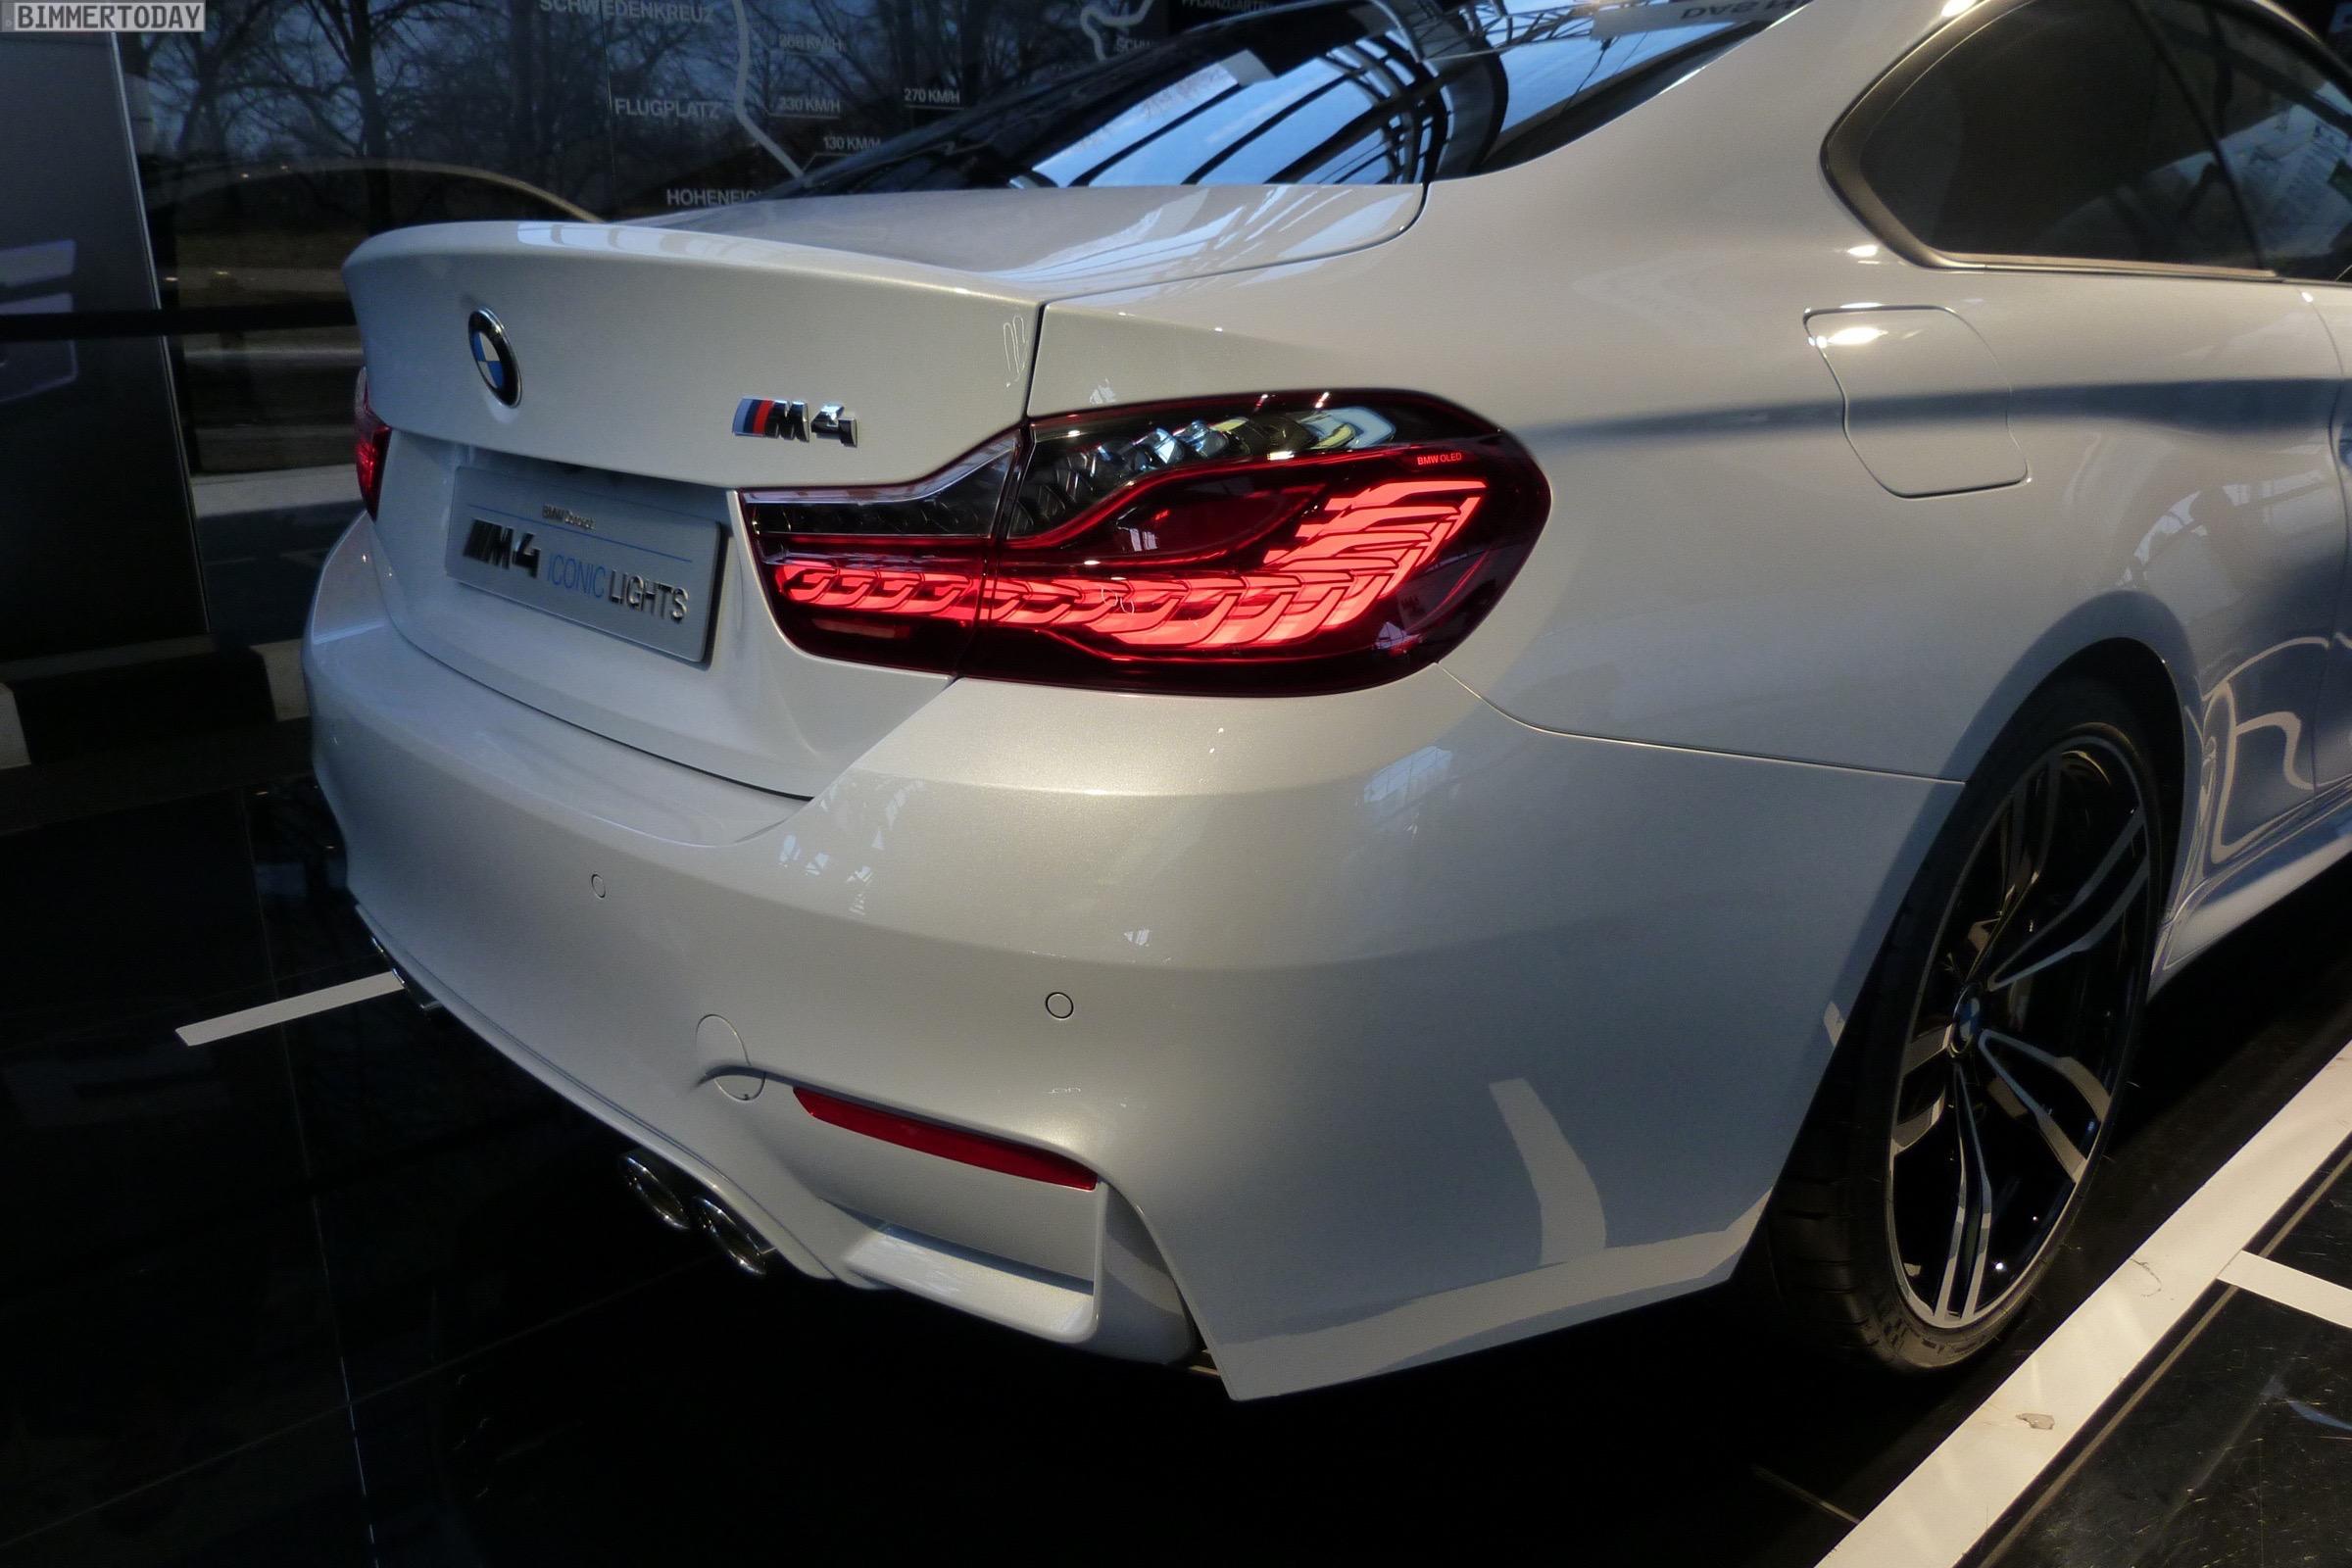 Bmw M4 Concept Iconic Lights Displayed At Bmw Welt